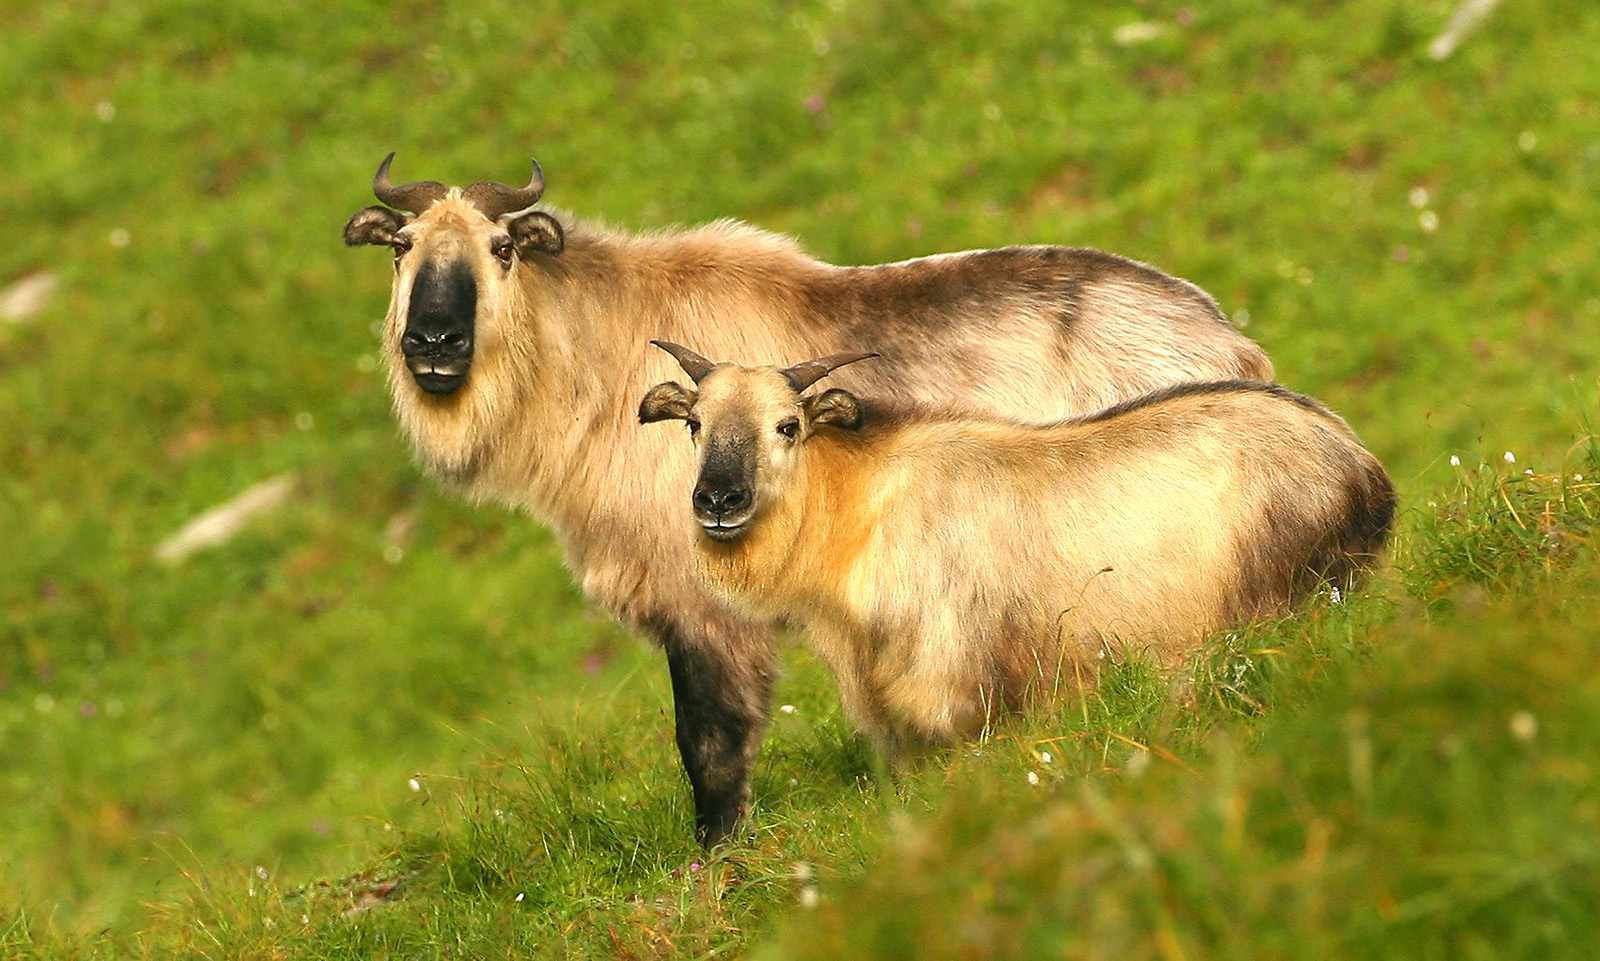 takin, a type of antelope-goat